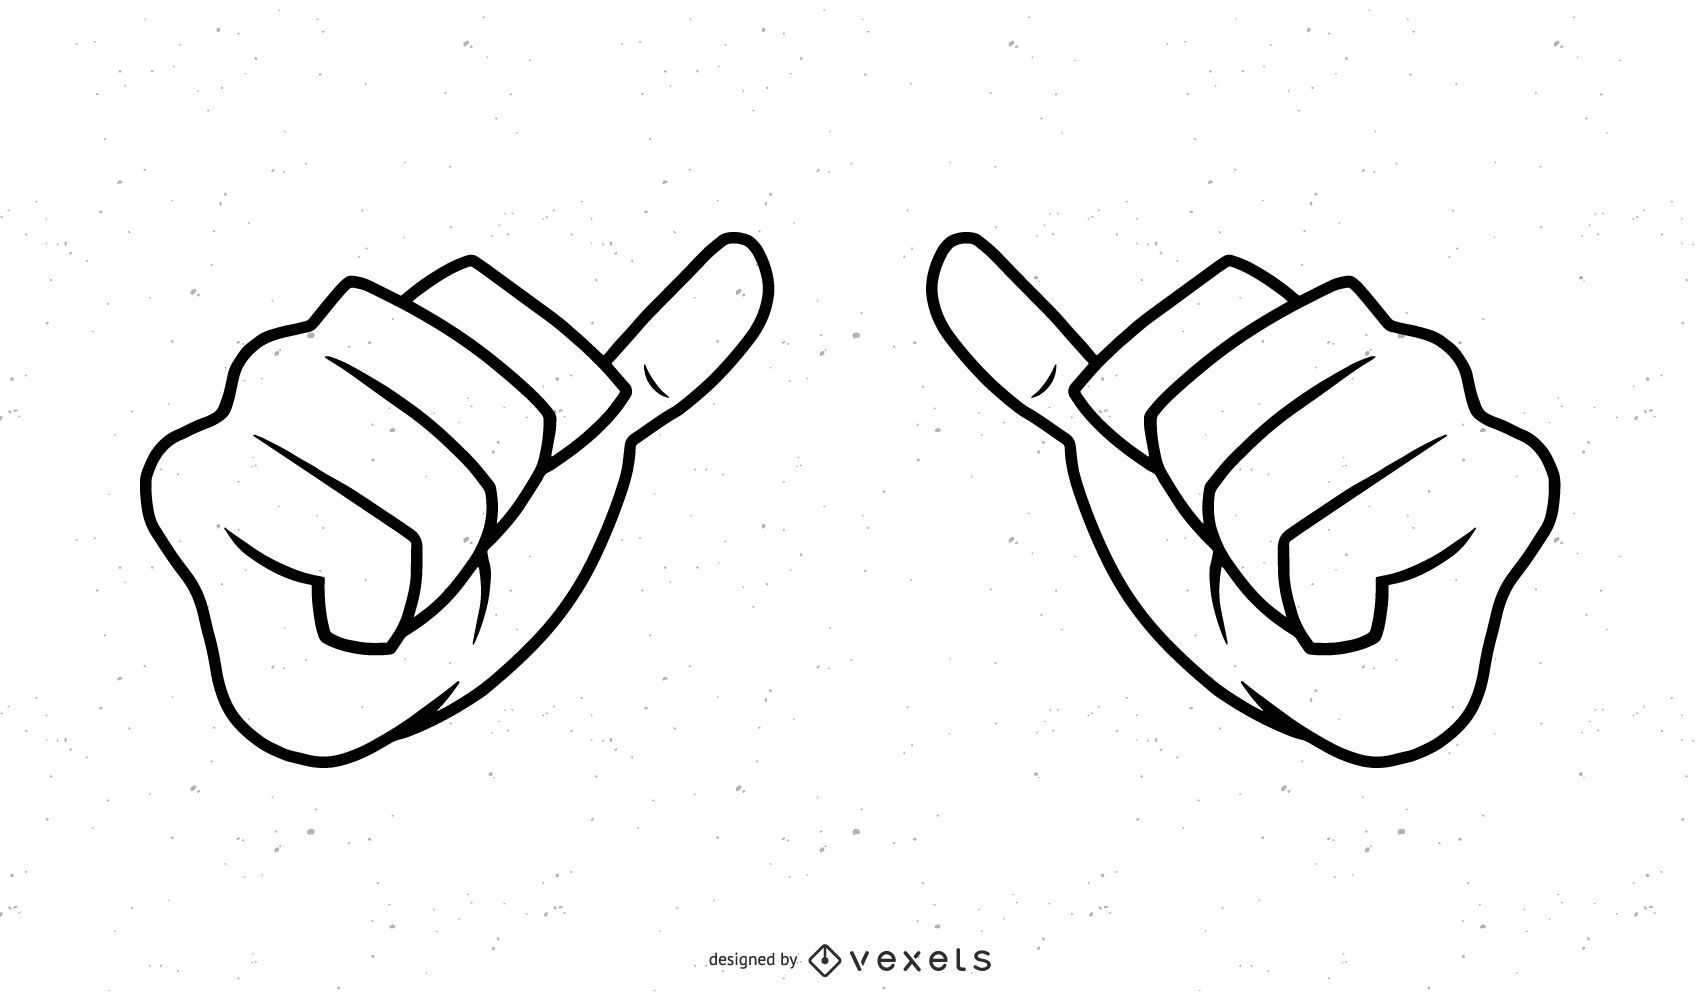 Hands stroke illustration